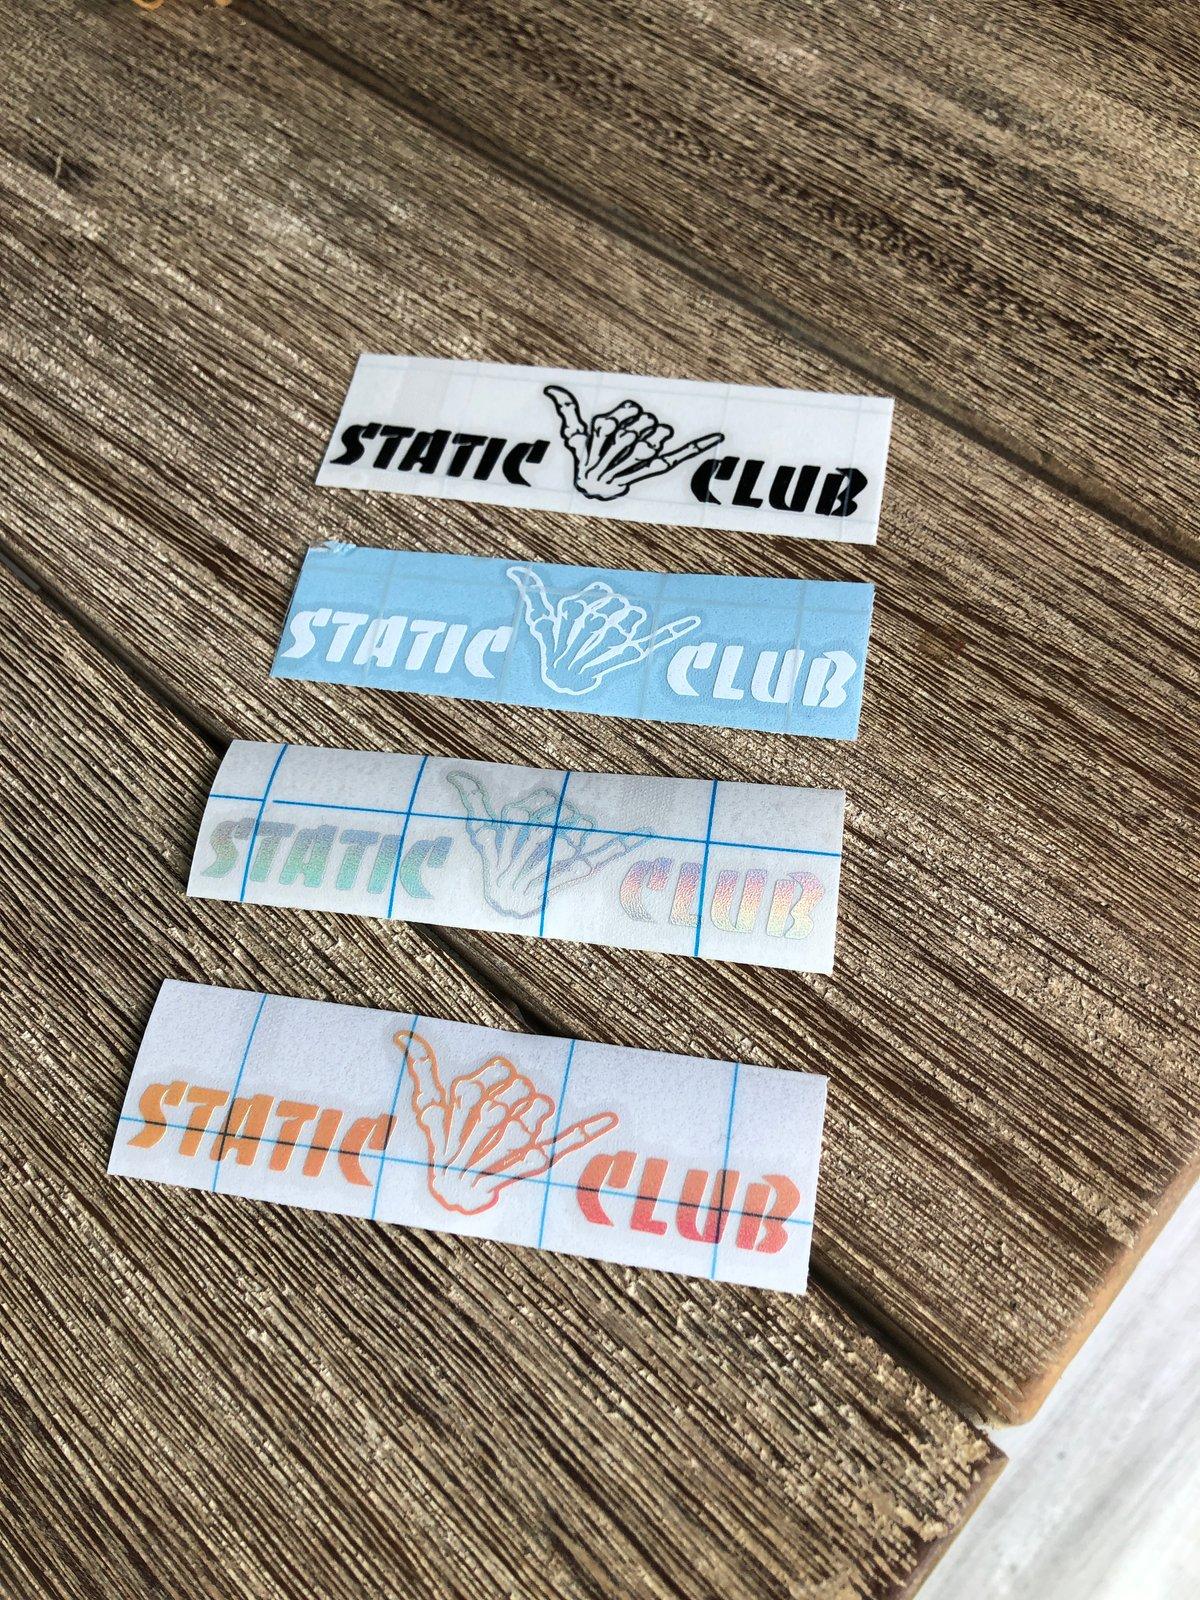 Static Club Mini Banger (decal)